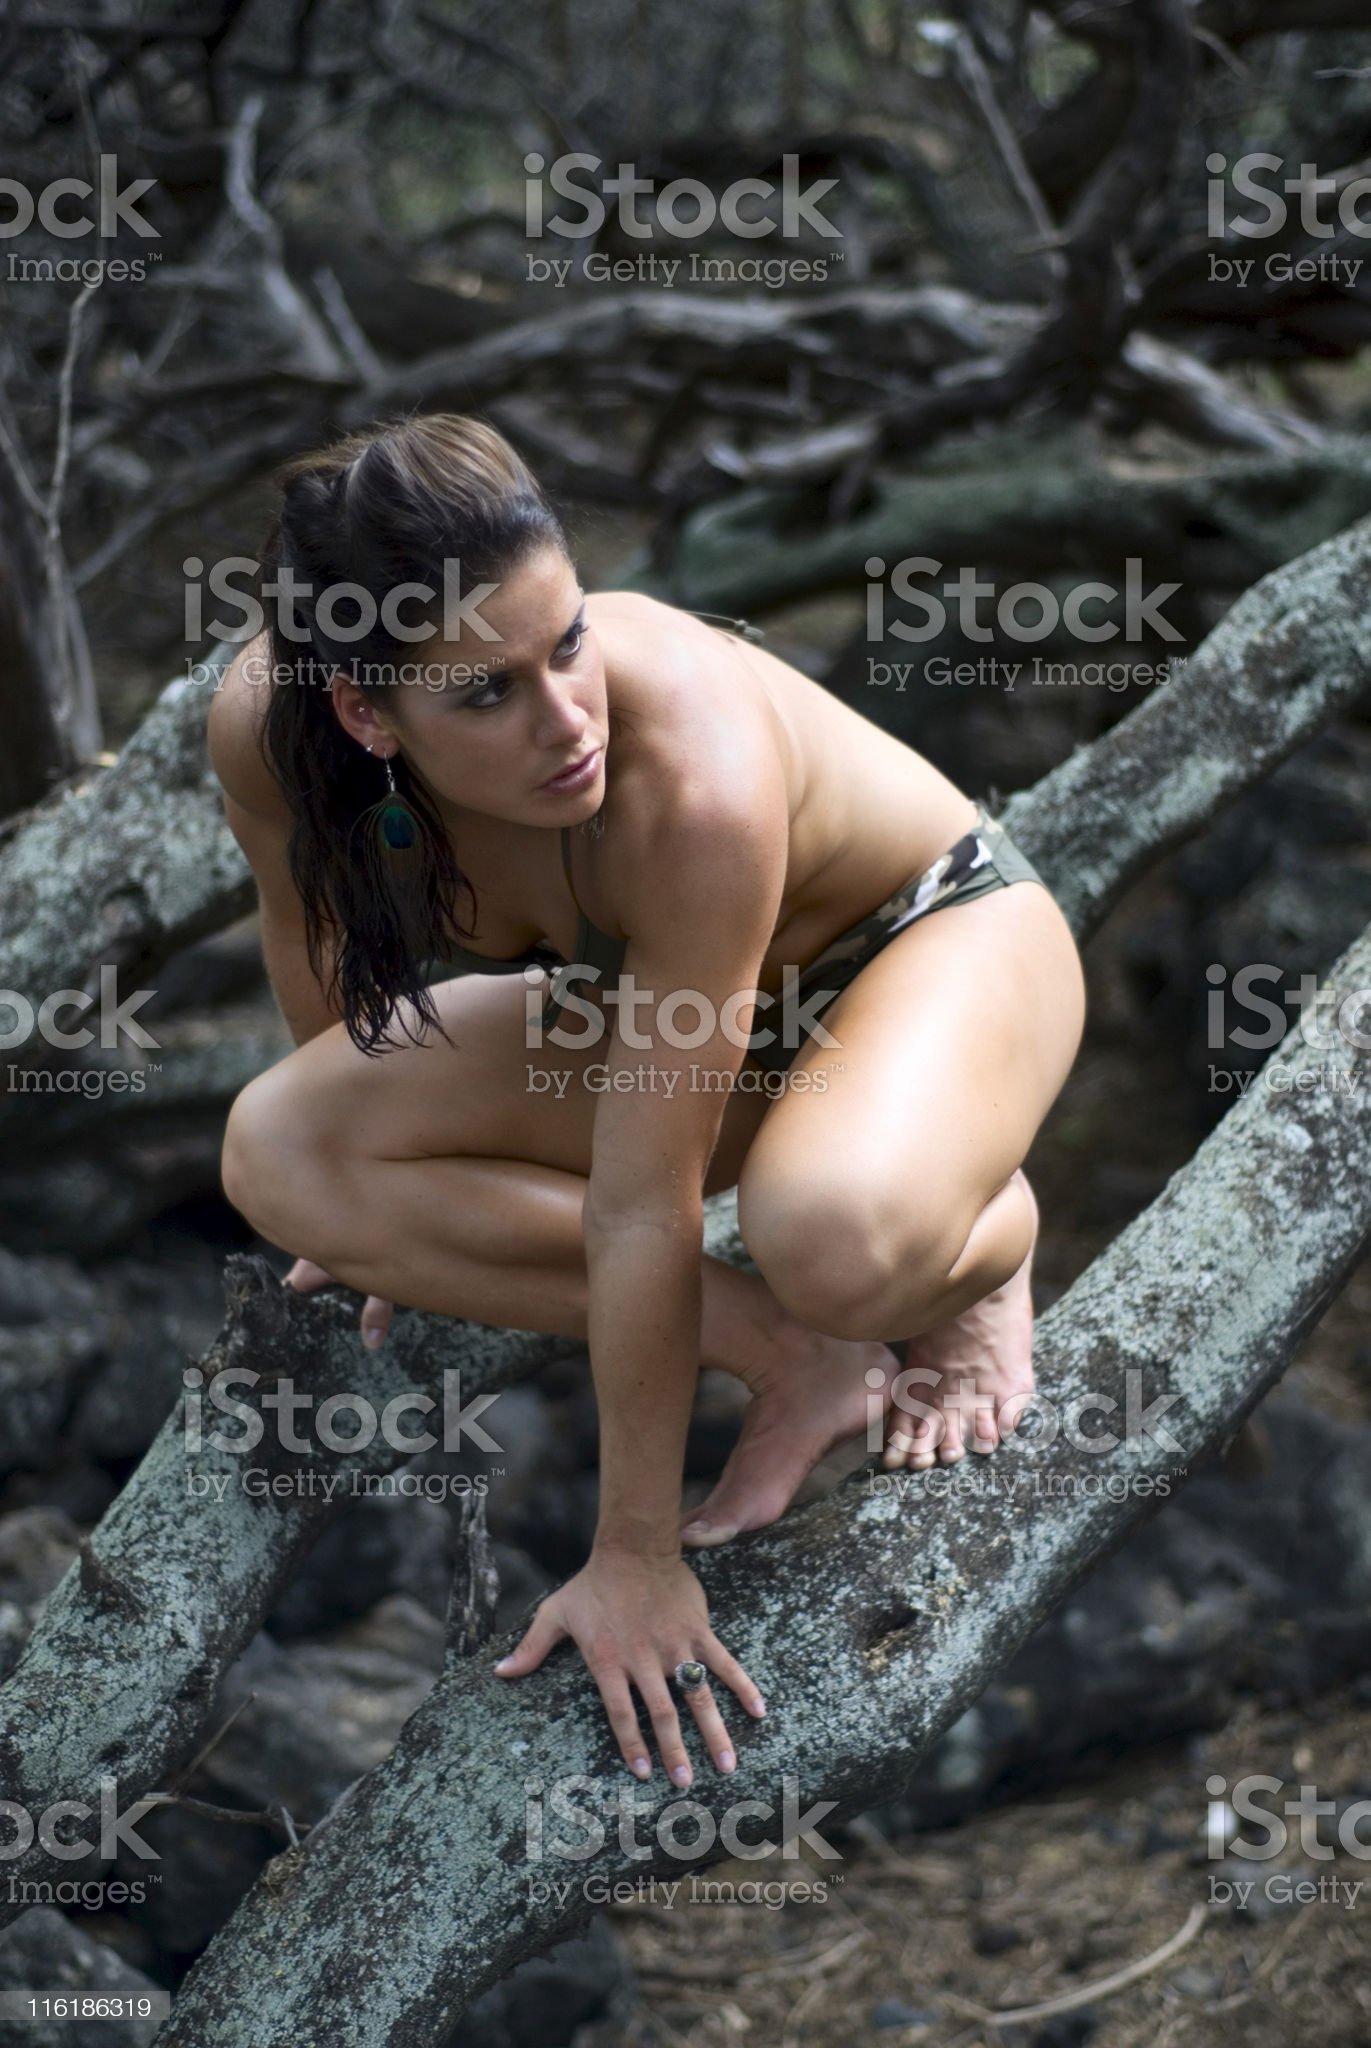 Wilderness Portrait royalty-free stock photo